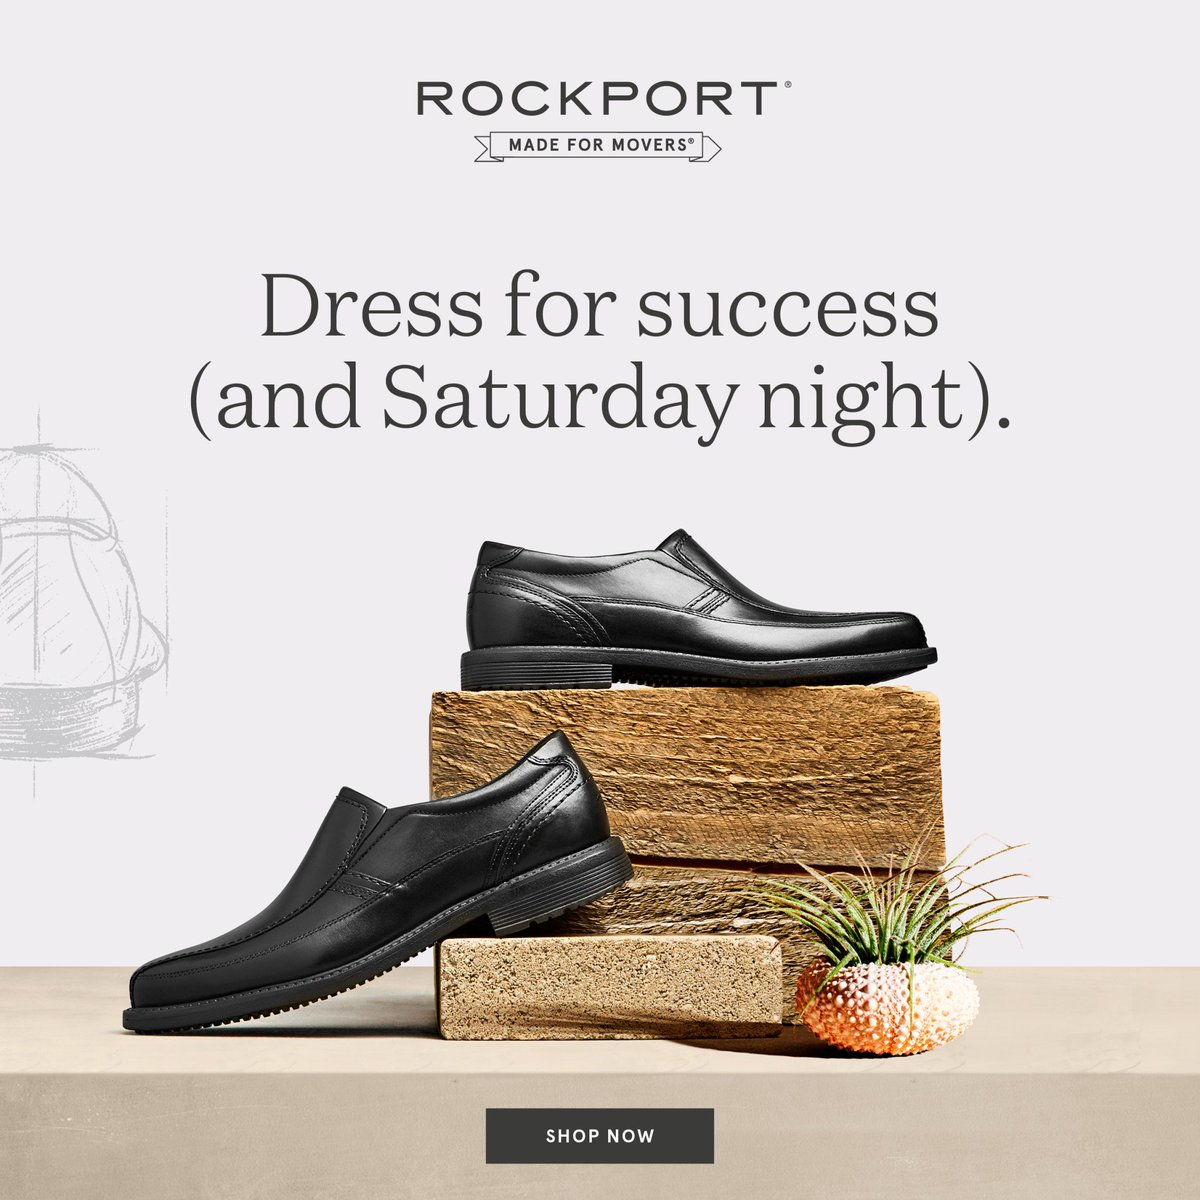 Rockport Week at Boscov's! Treat Dad